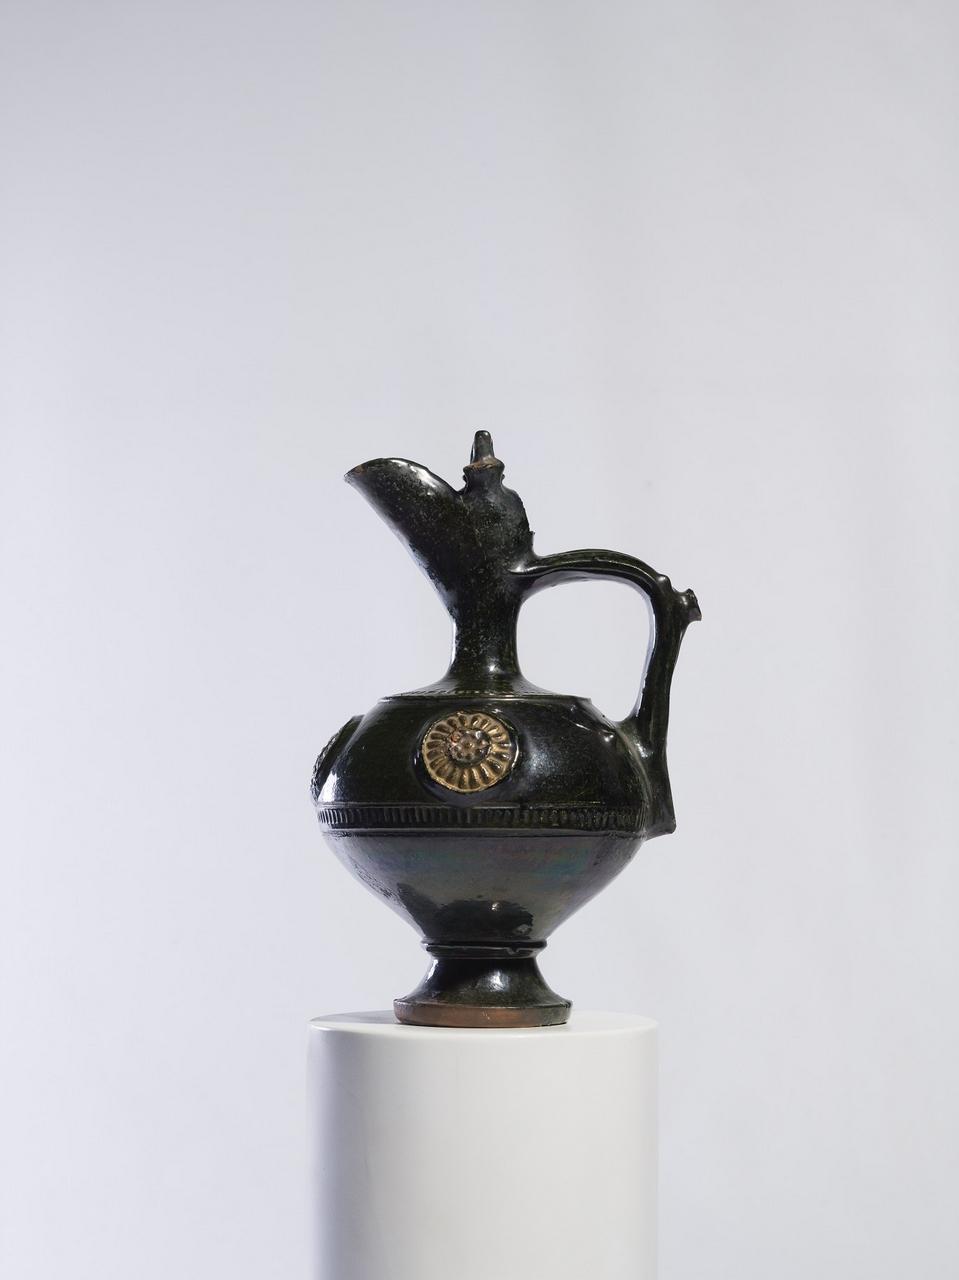 Krčah keramický na podstavci . Keramikrug auf einem Sockel